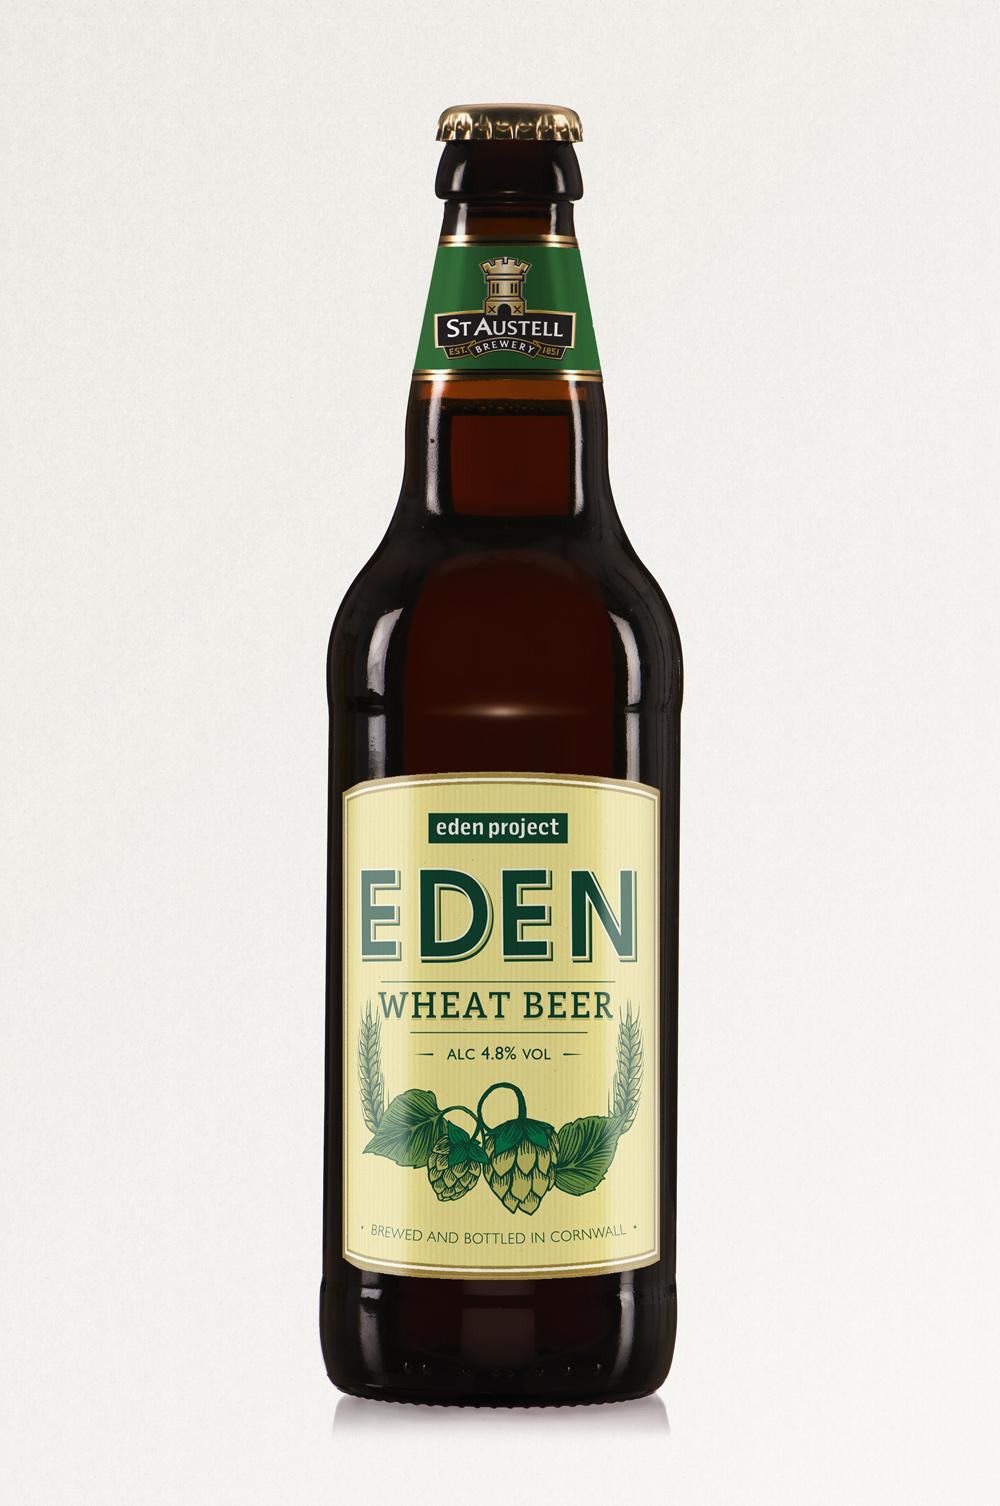 EDEN IPA, St Austell Brewery, wheat beer bottle label design